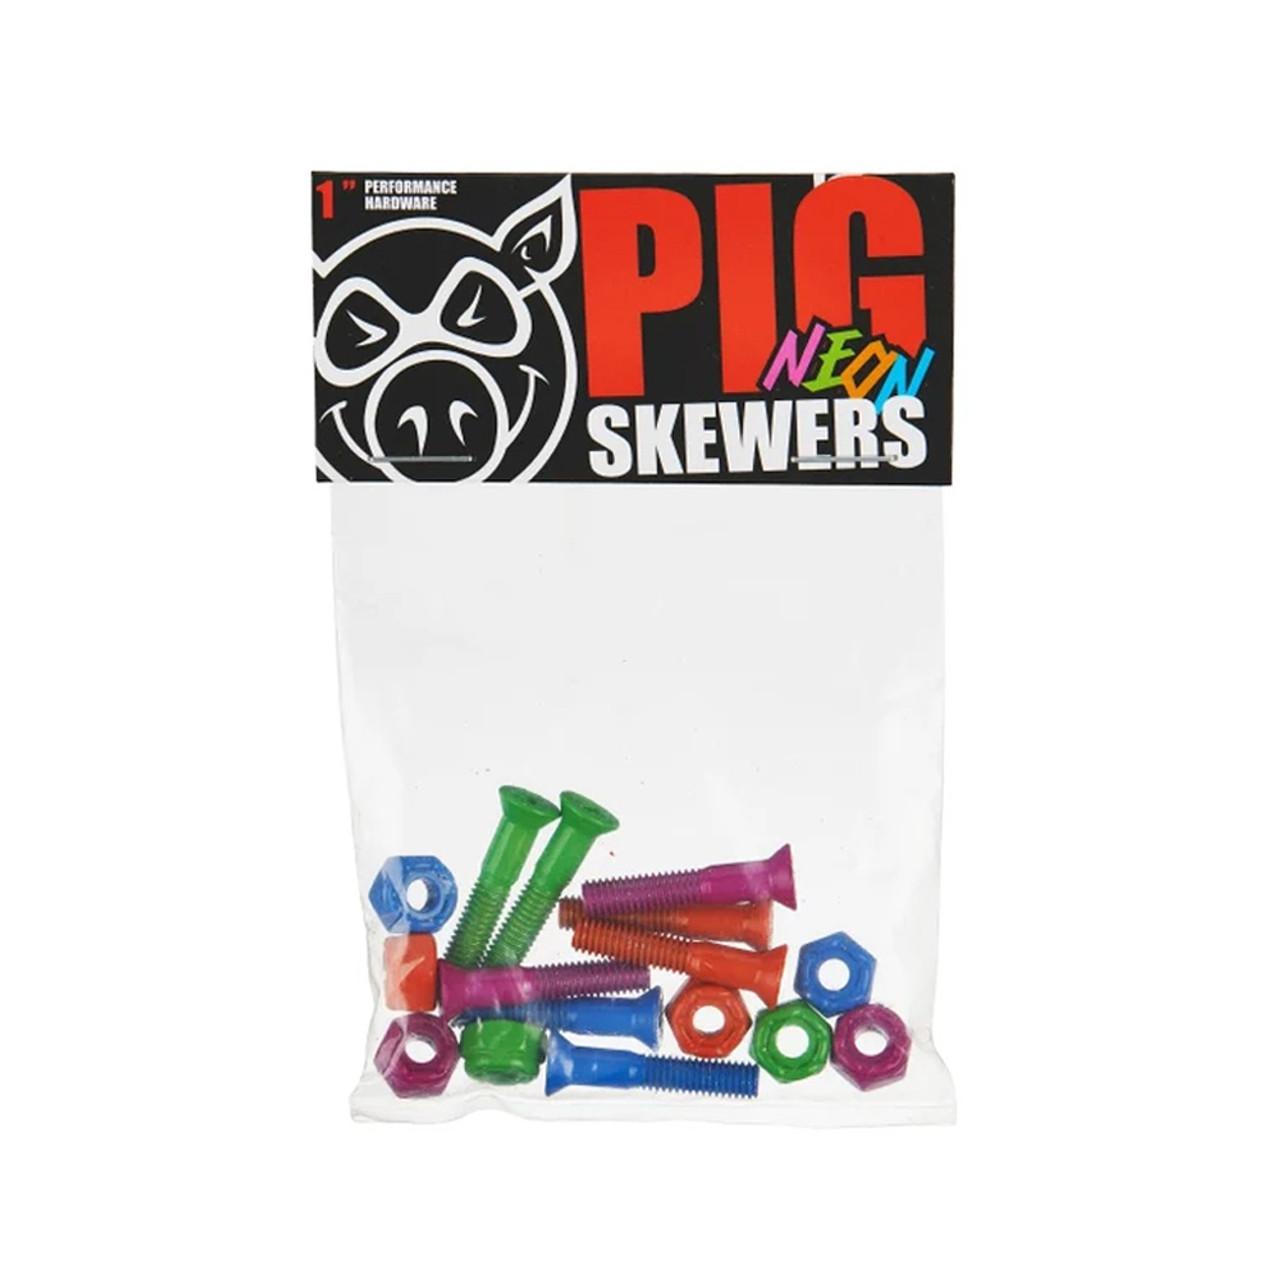 PIG Neon 1 Phillips Head Hardware